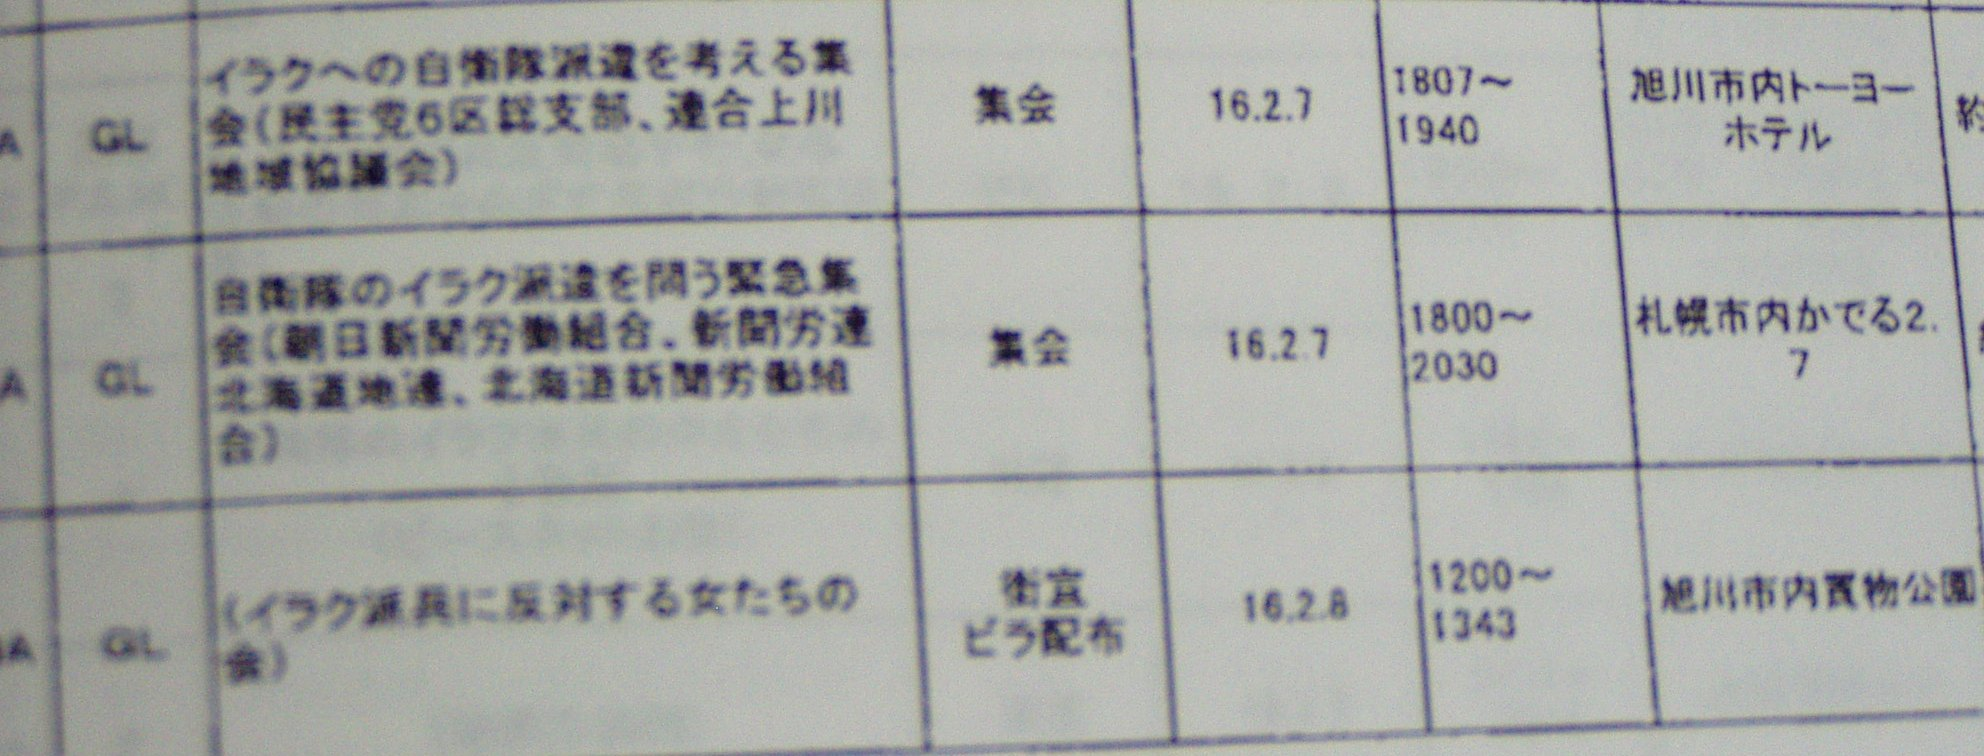 P6280056